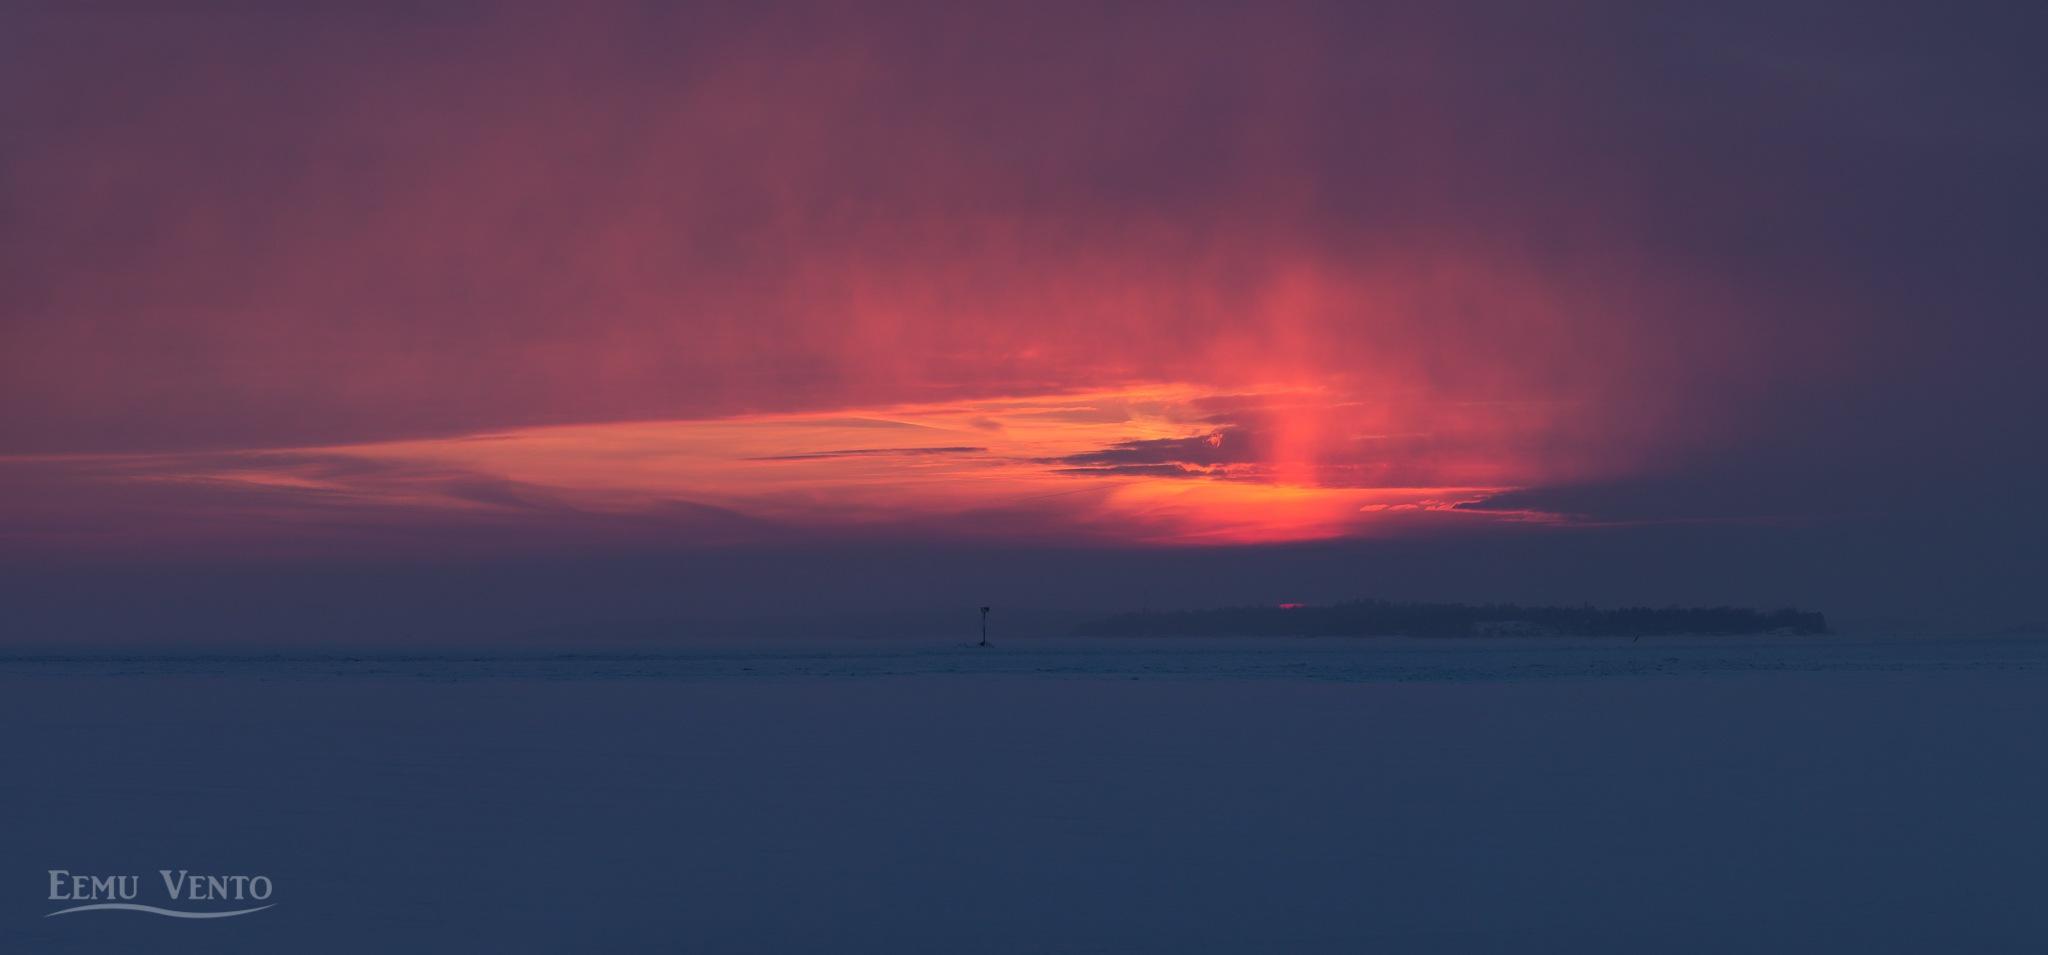 Sunset by Eemu Vento